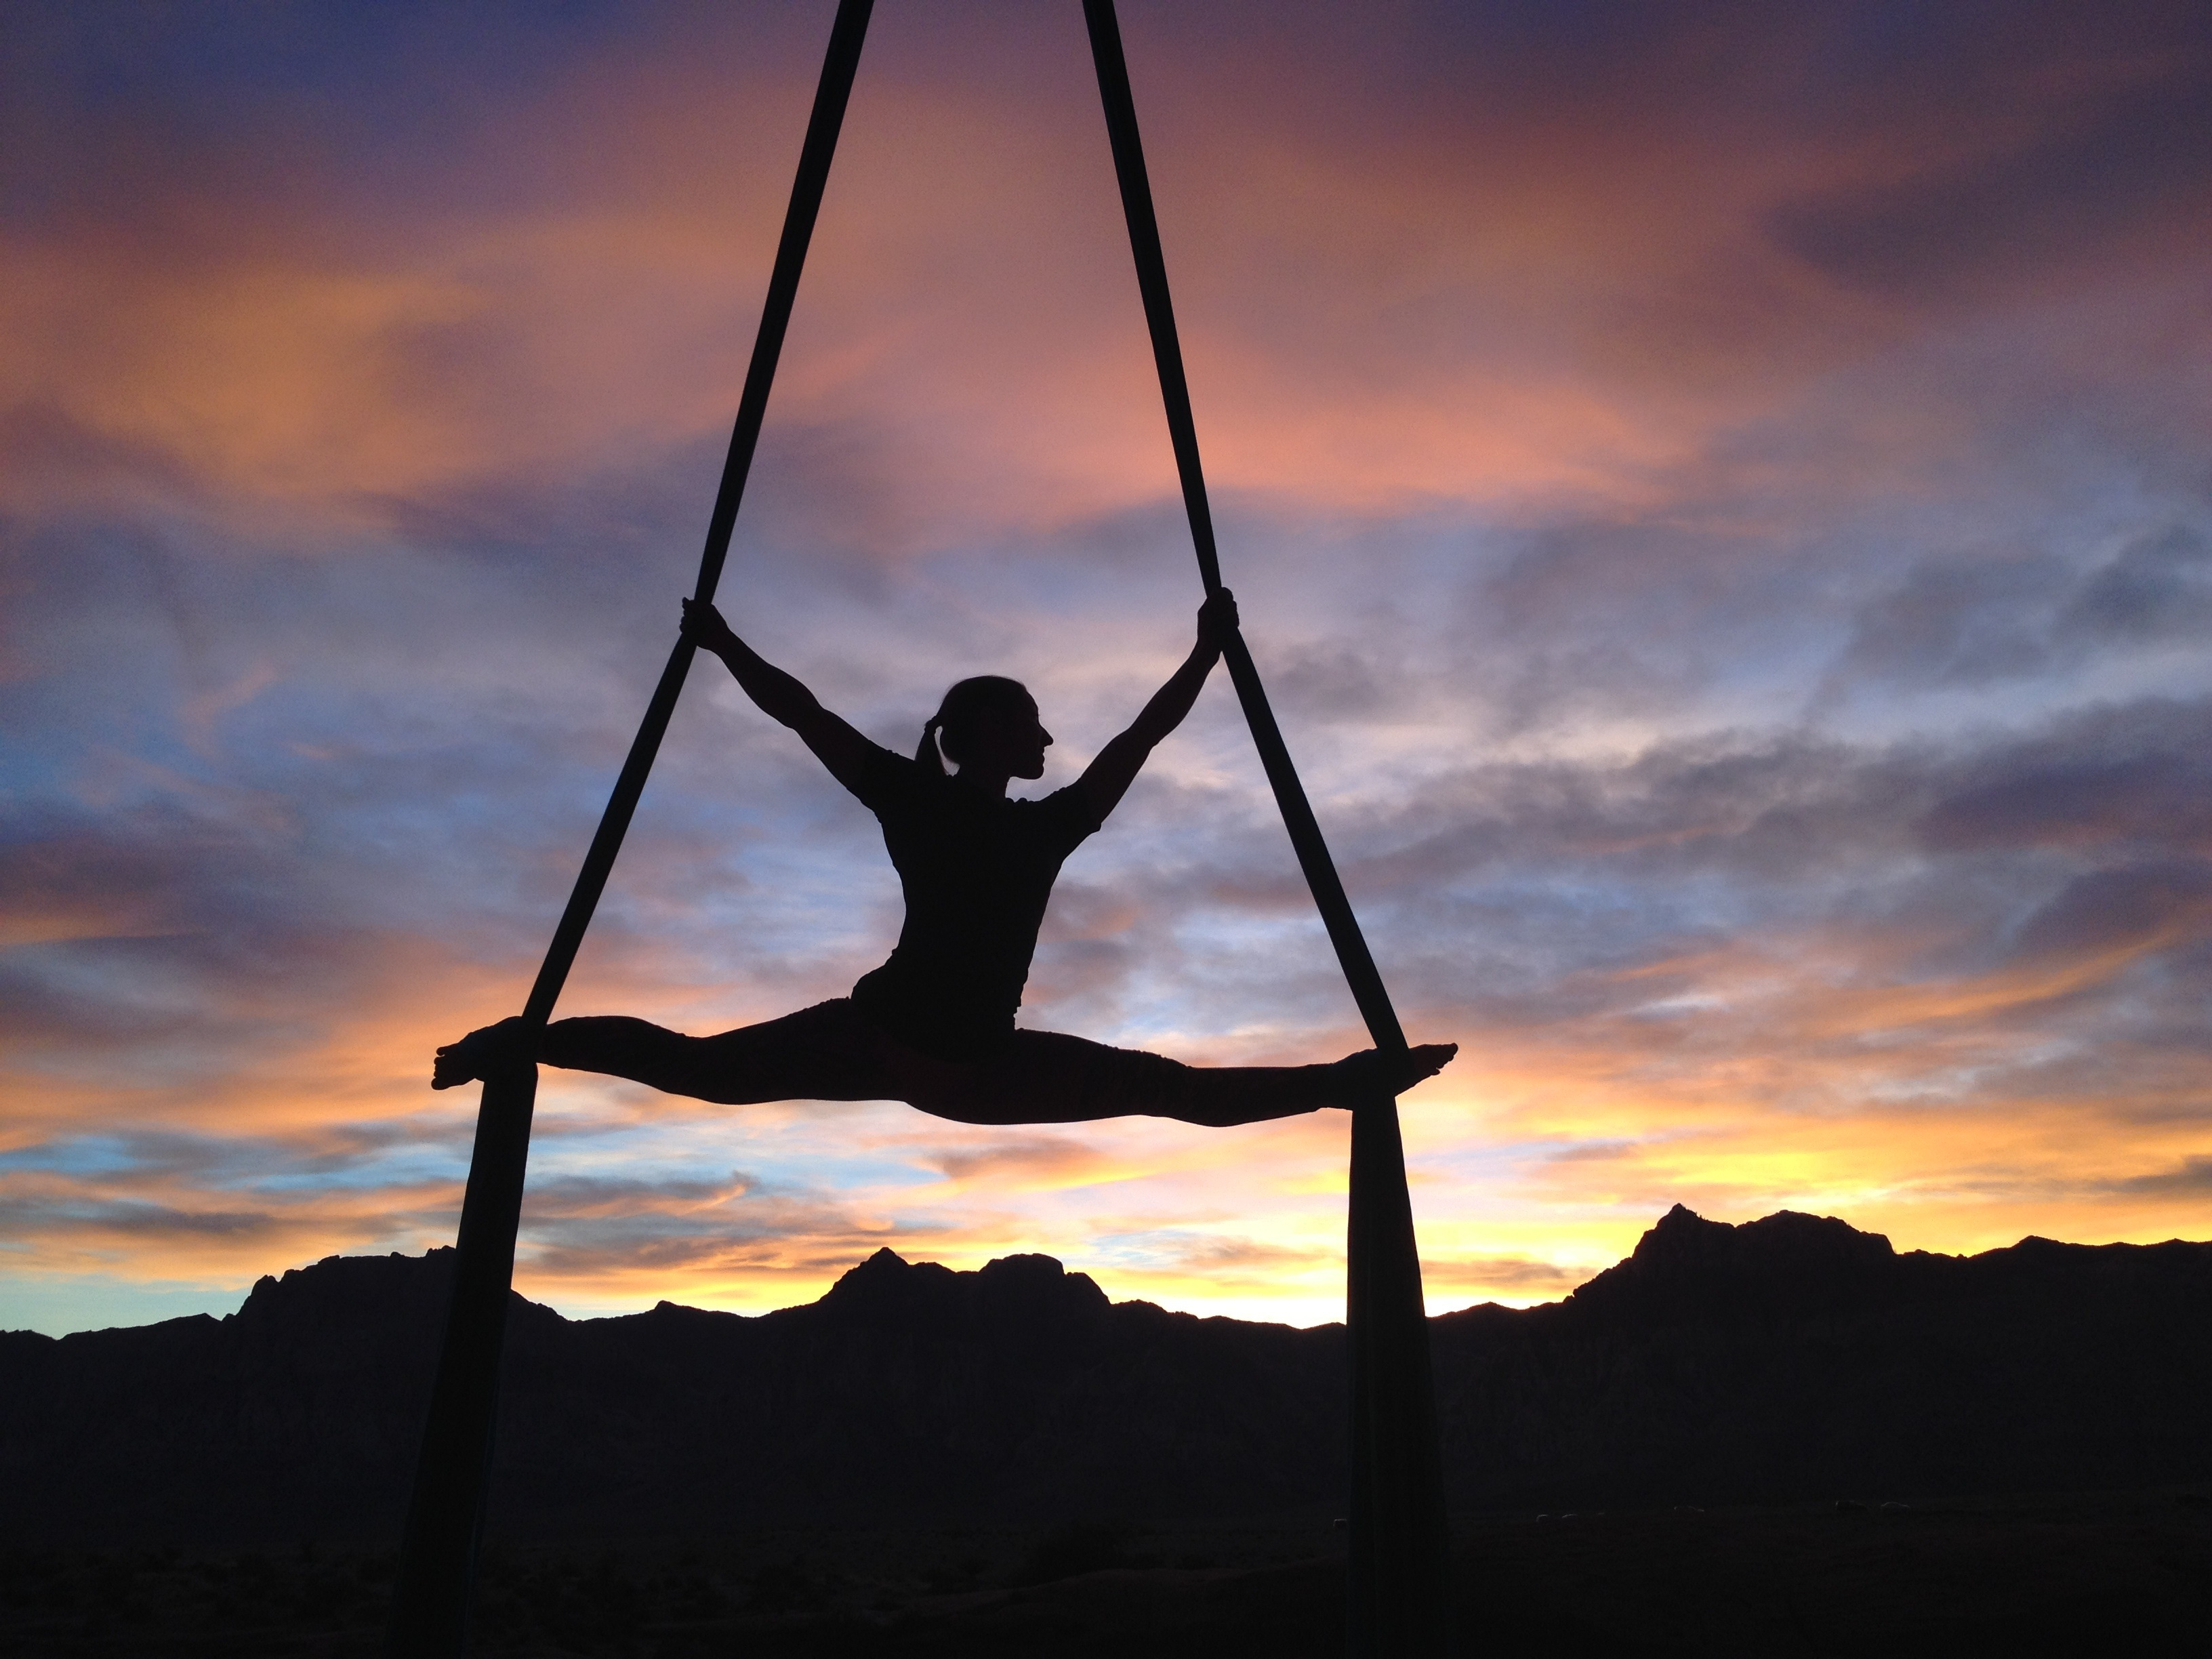 Free stock photos of yoga · Pexels